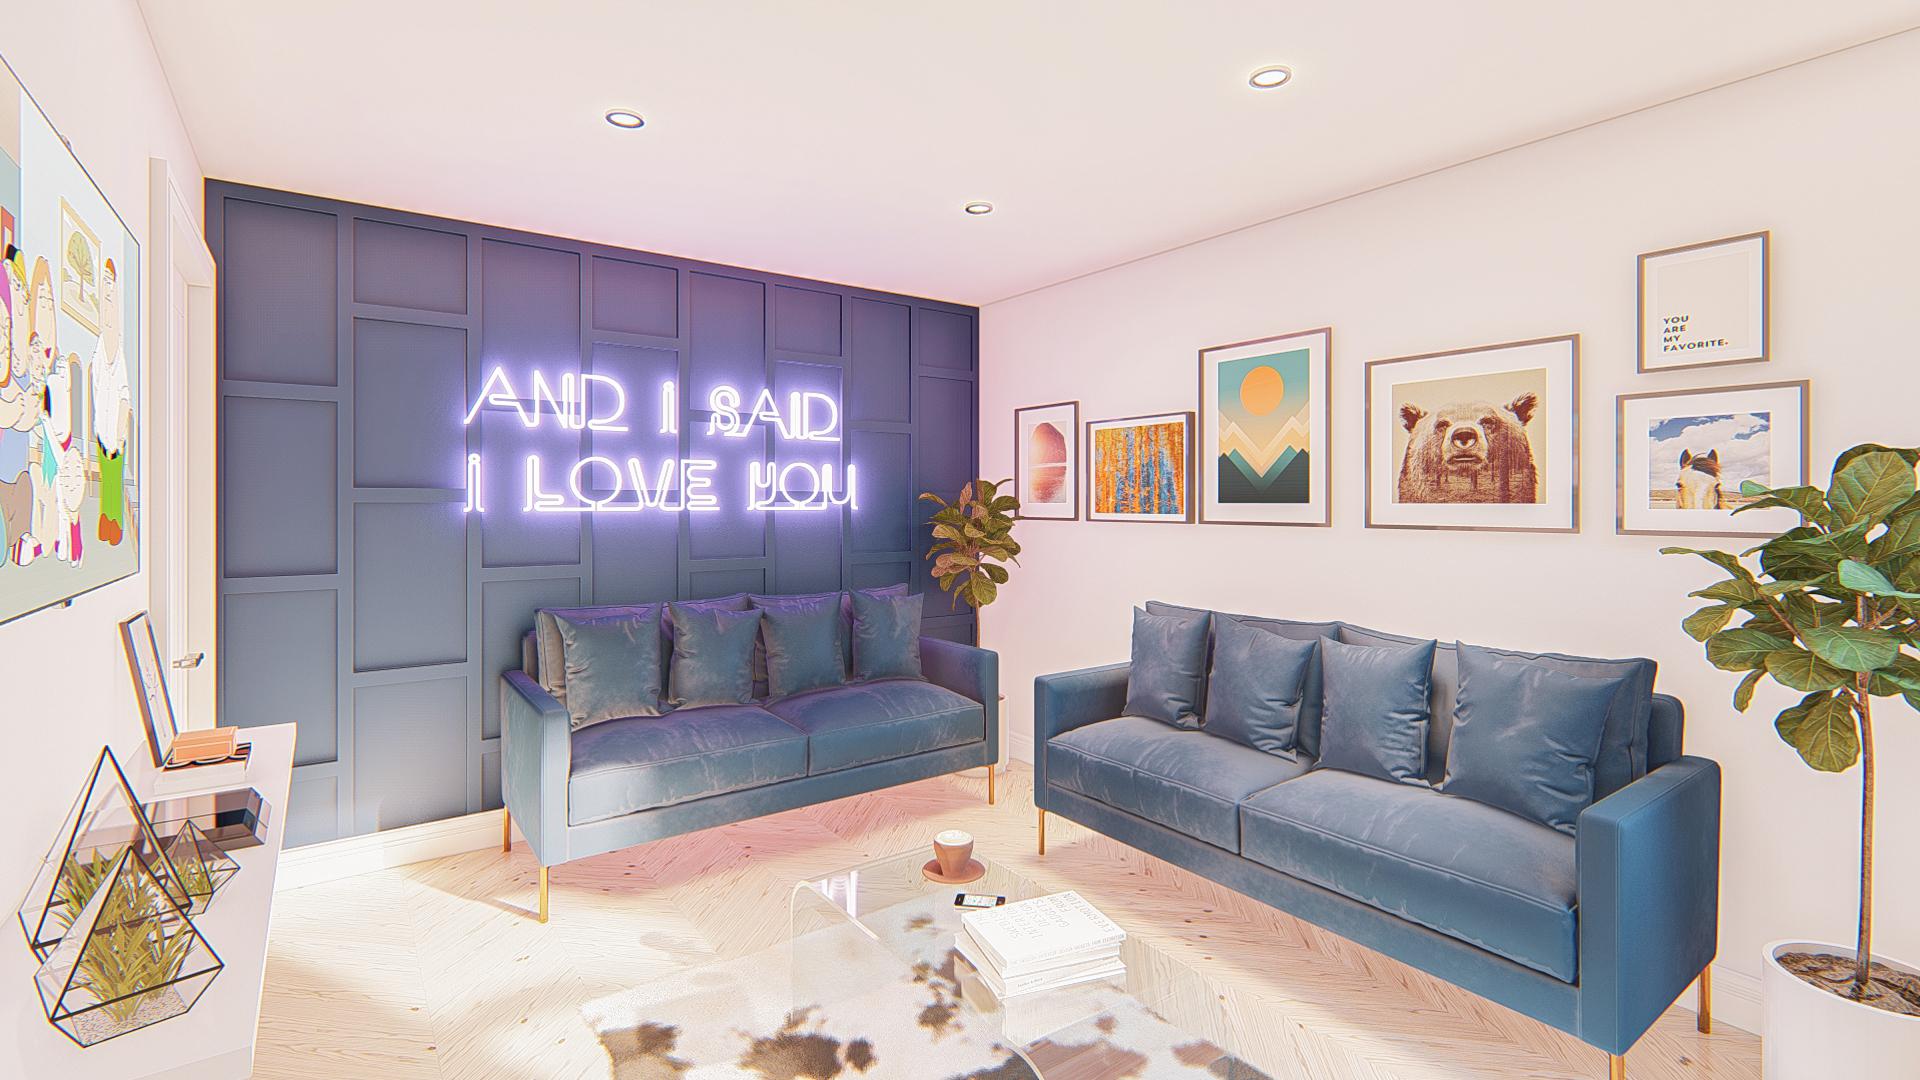 Kensington 6 Bed Accommodation - Caro Lettings